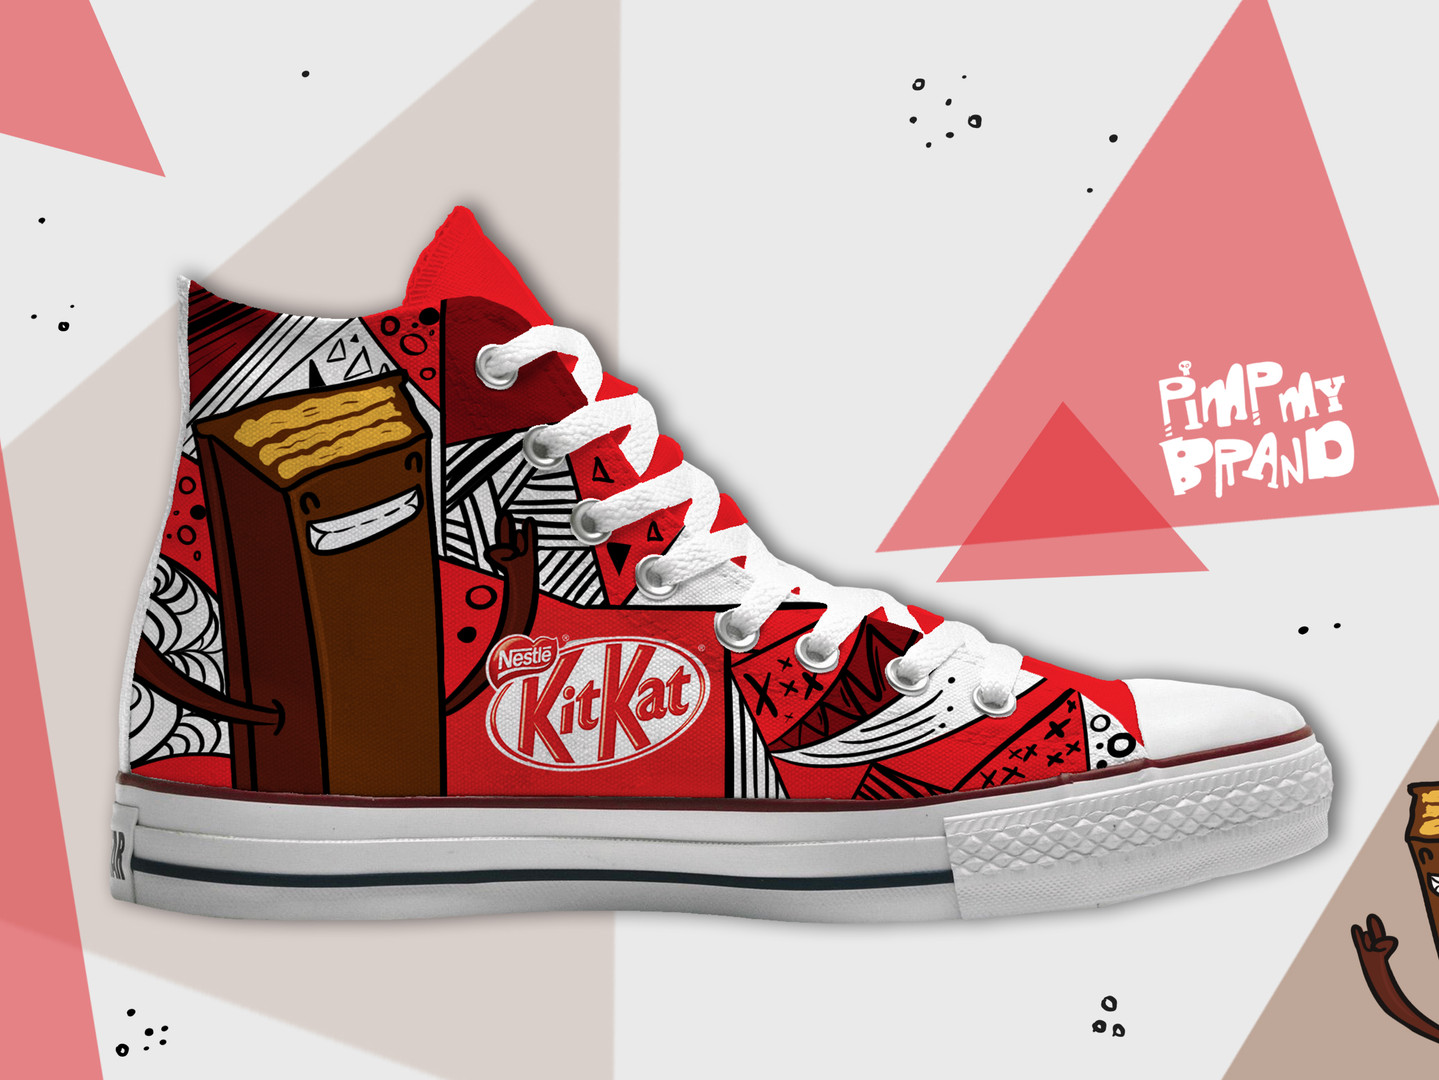 Kit Kat Kicks